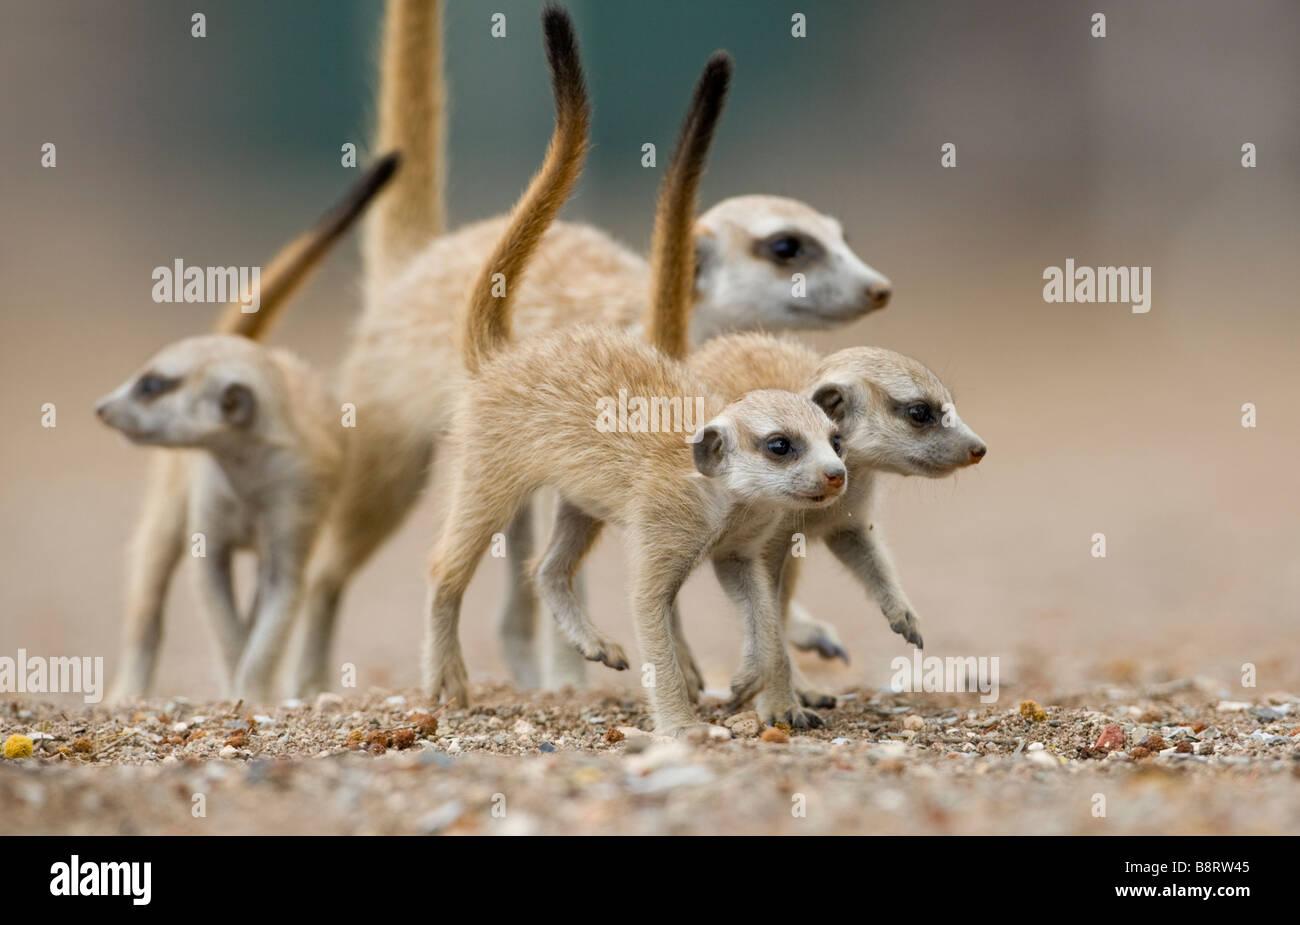 Afrika Namibia Keetmanshoop Meerkat Welpen Suricata Suricatta walking mit Erwachsenen außerhalb Fuchsbau in Stockbild